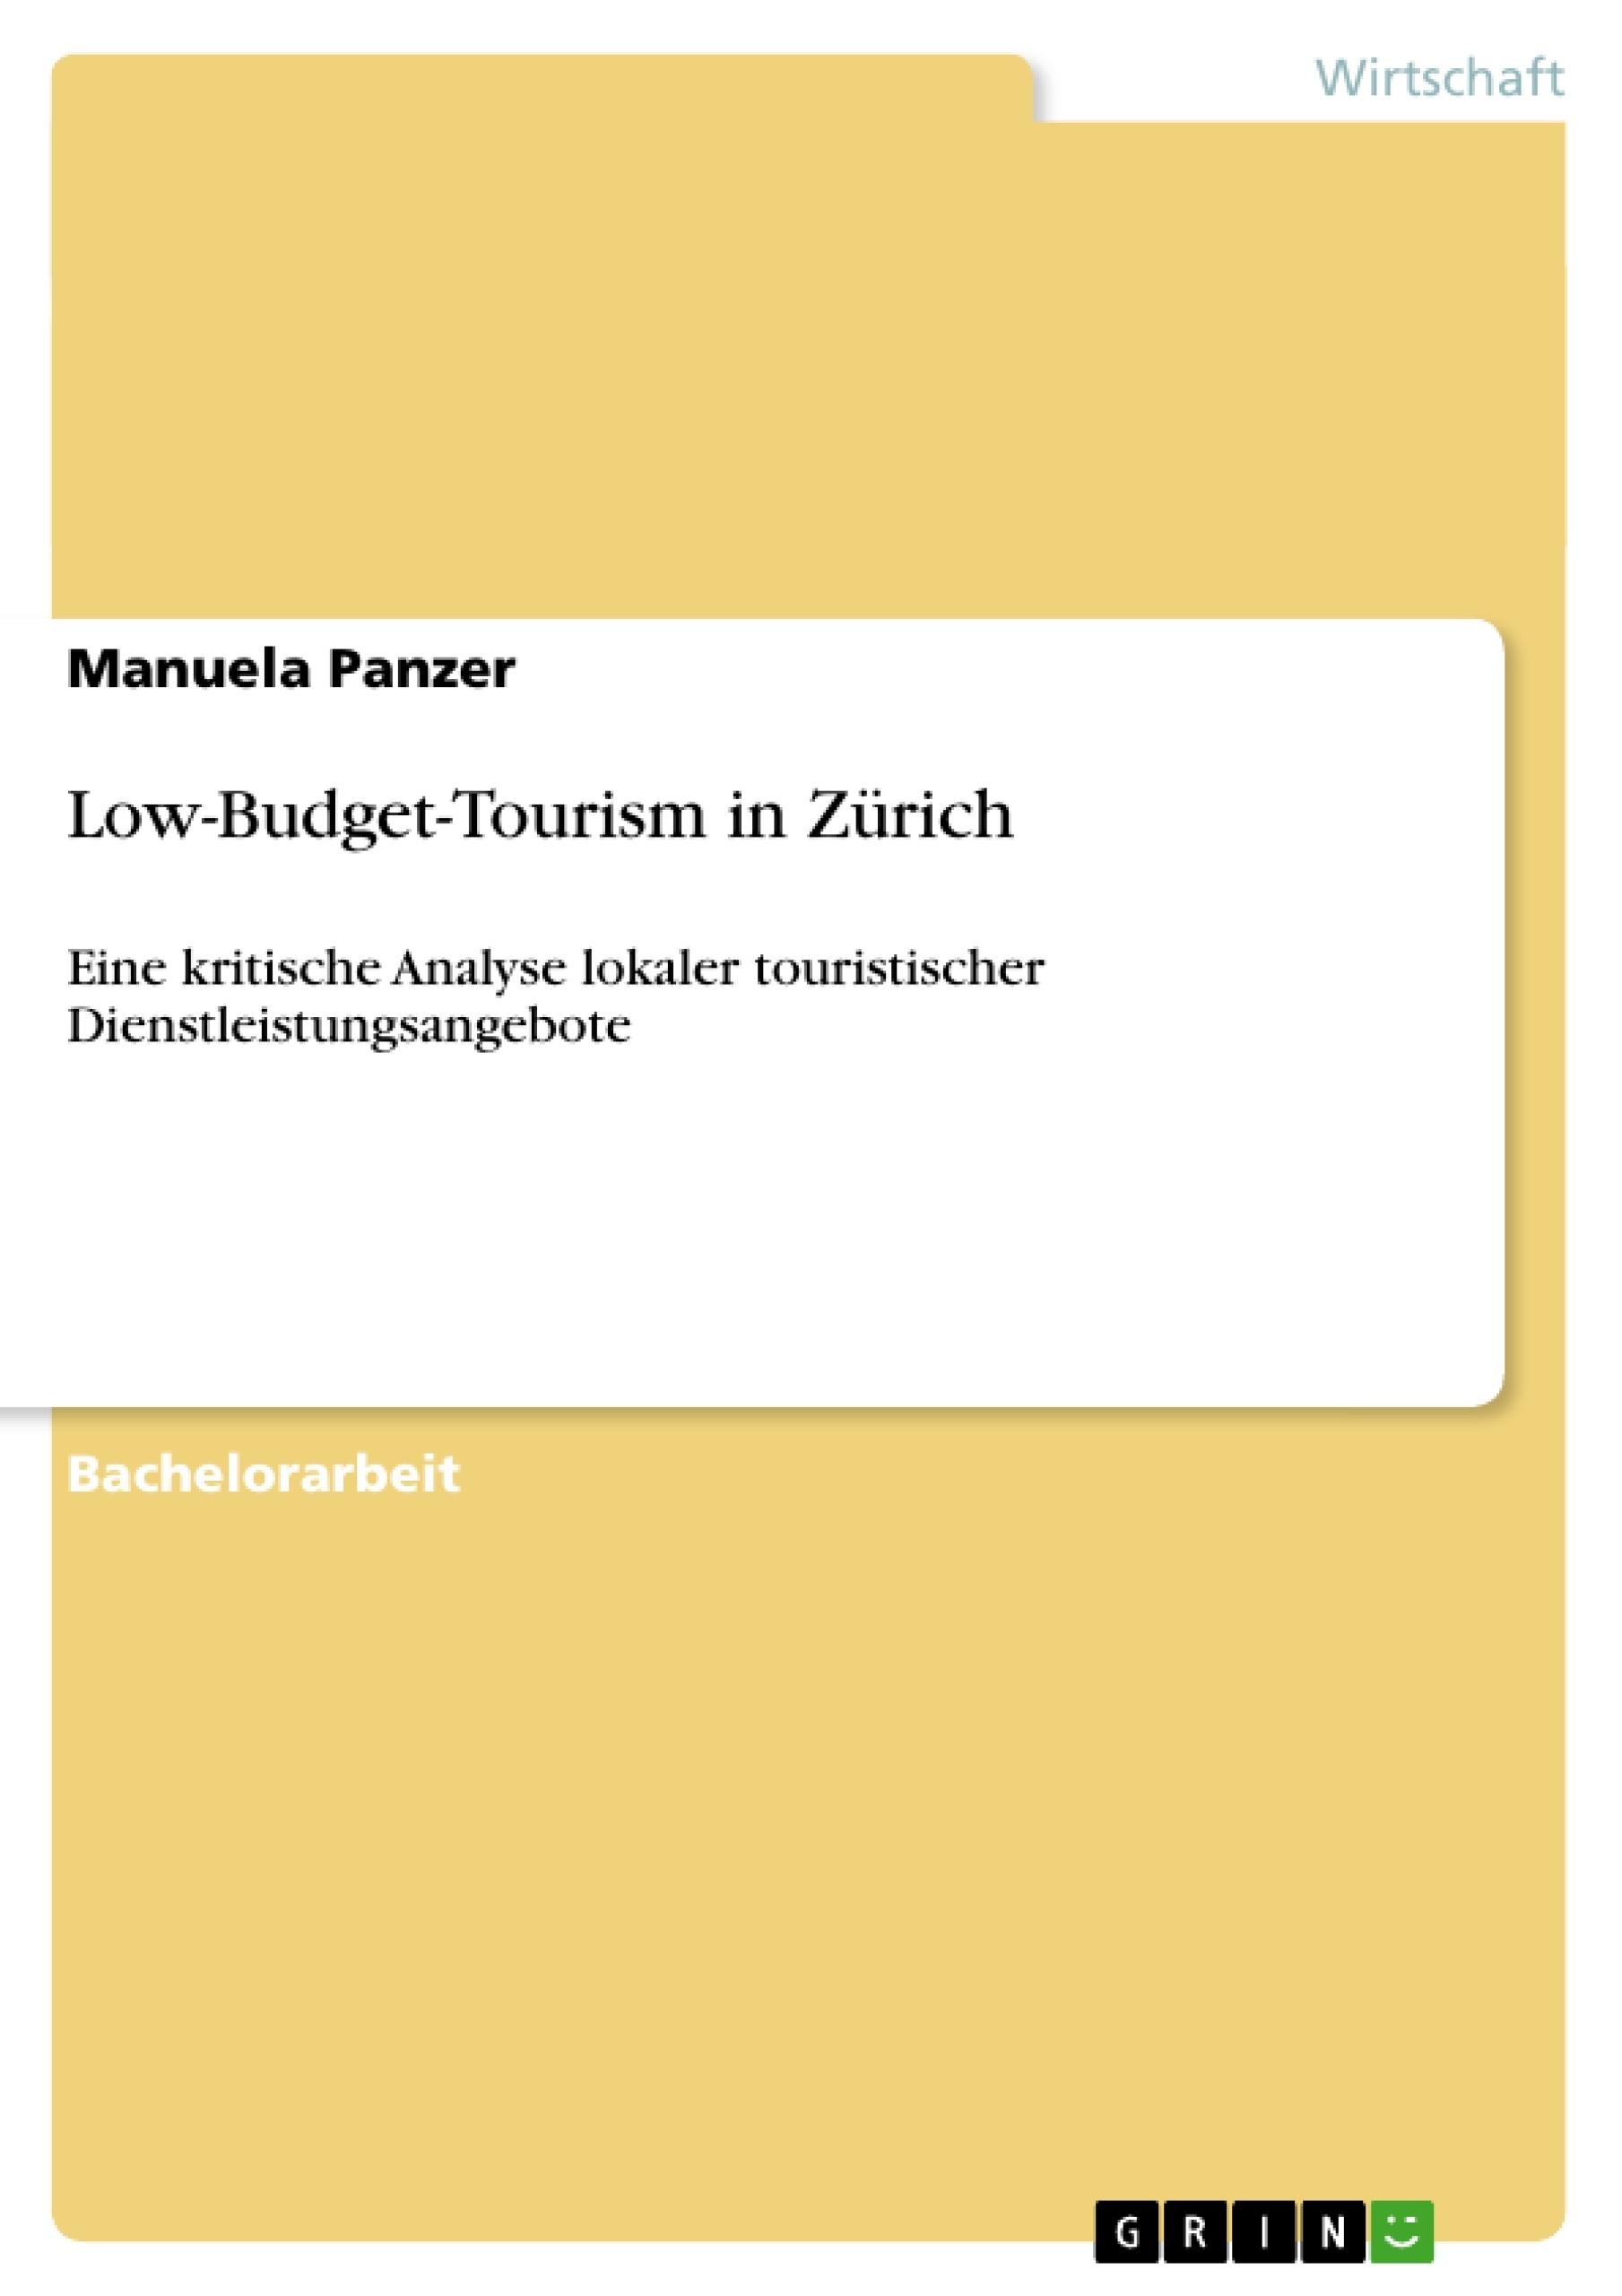 Titel: Low-Budget-Tourism in Zürich